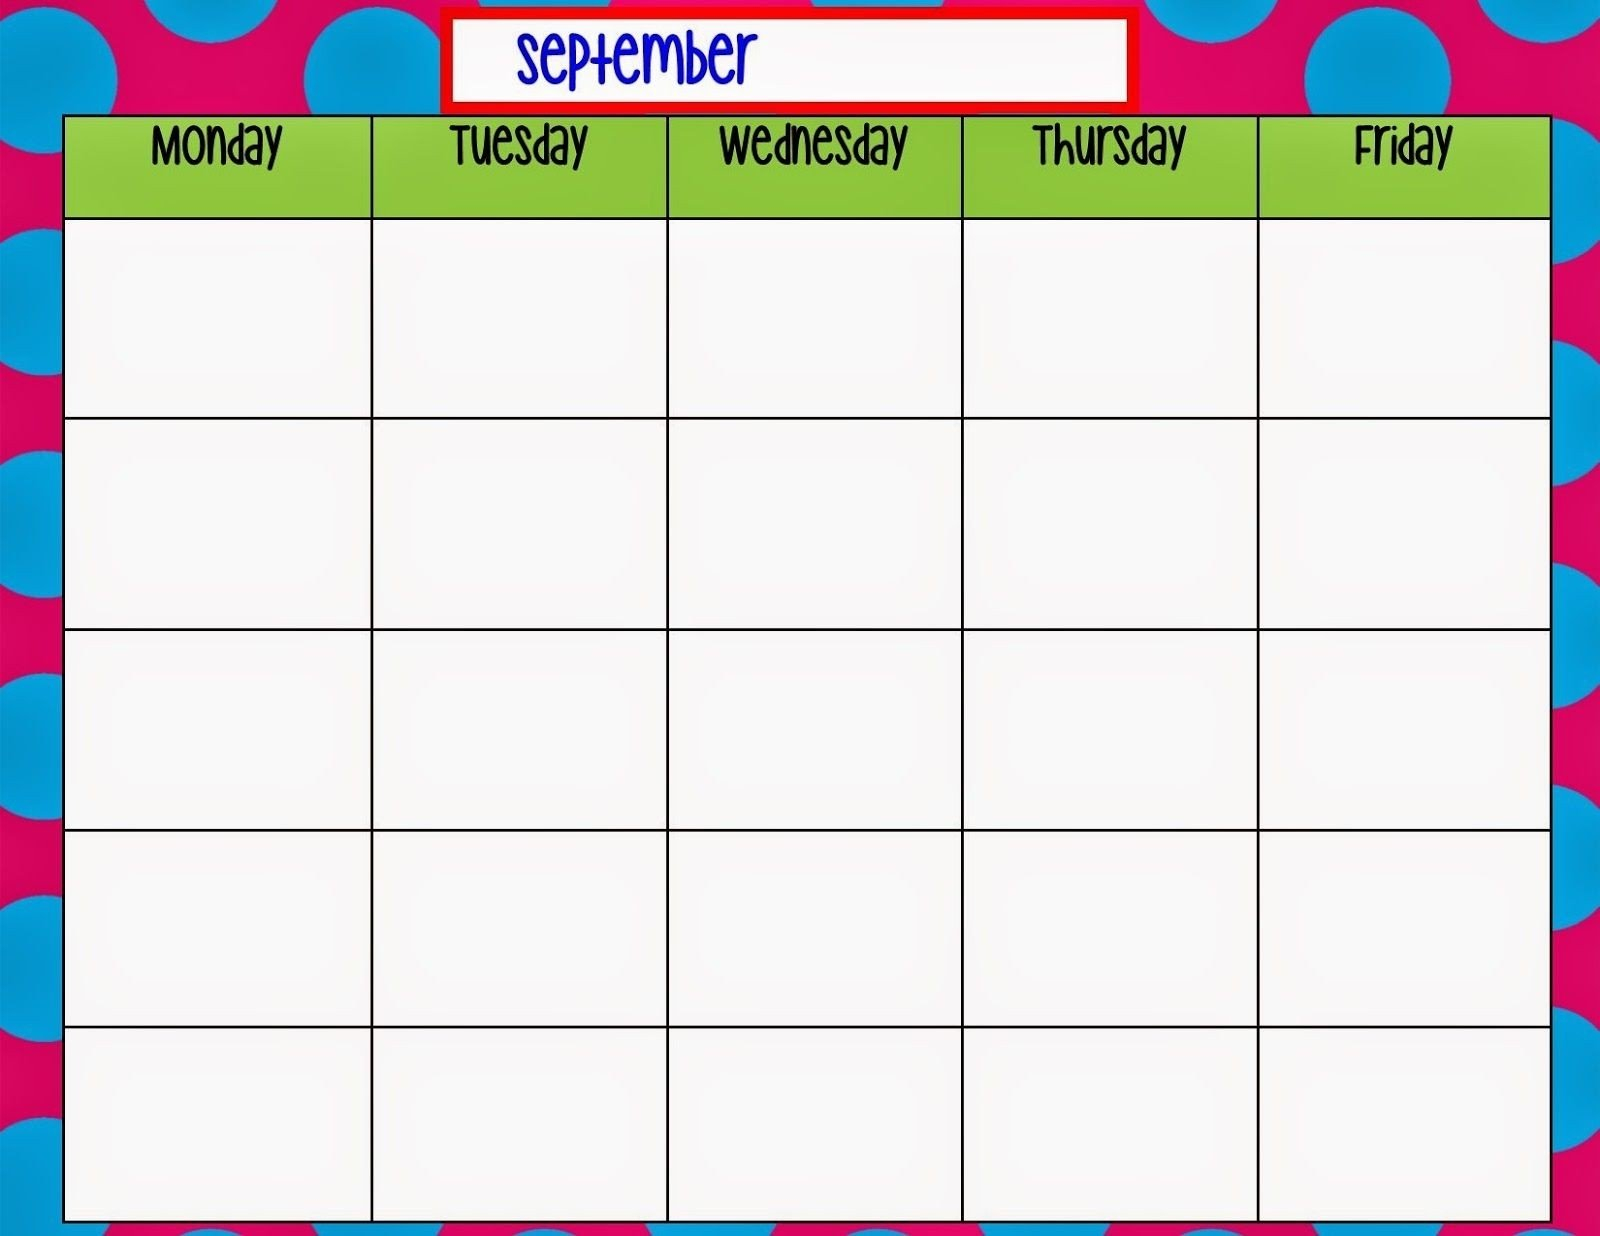 Blank Monday Through Friday Calendars | Calendar Template Monday Thru Friday Printable Calendar